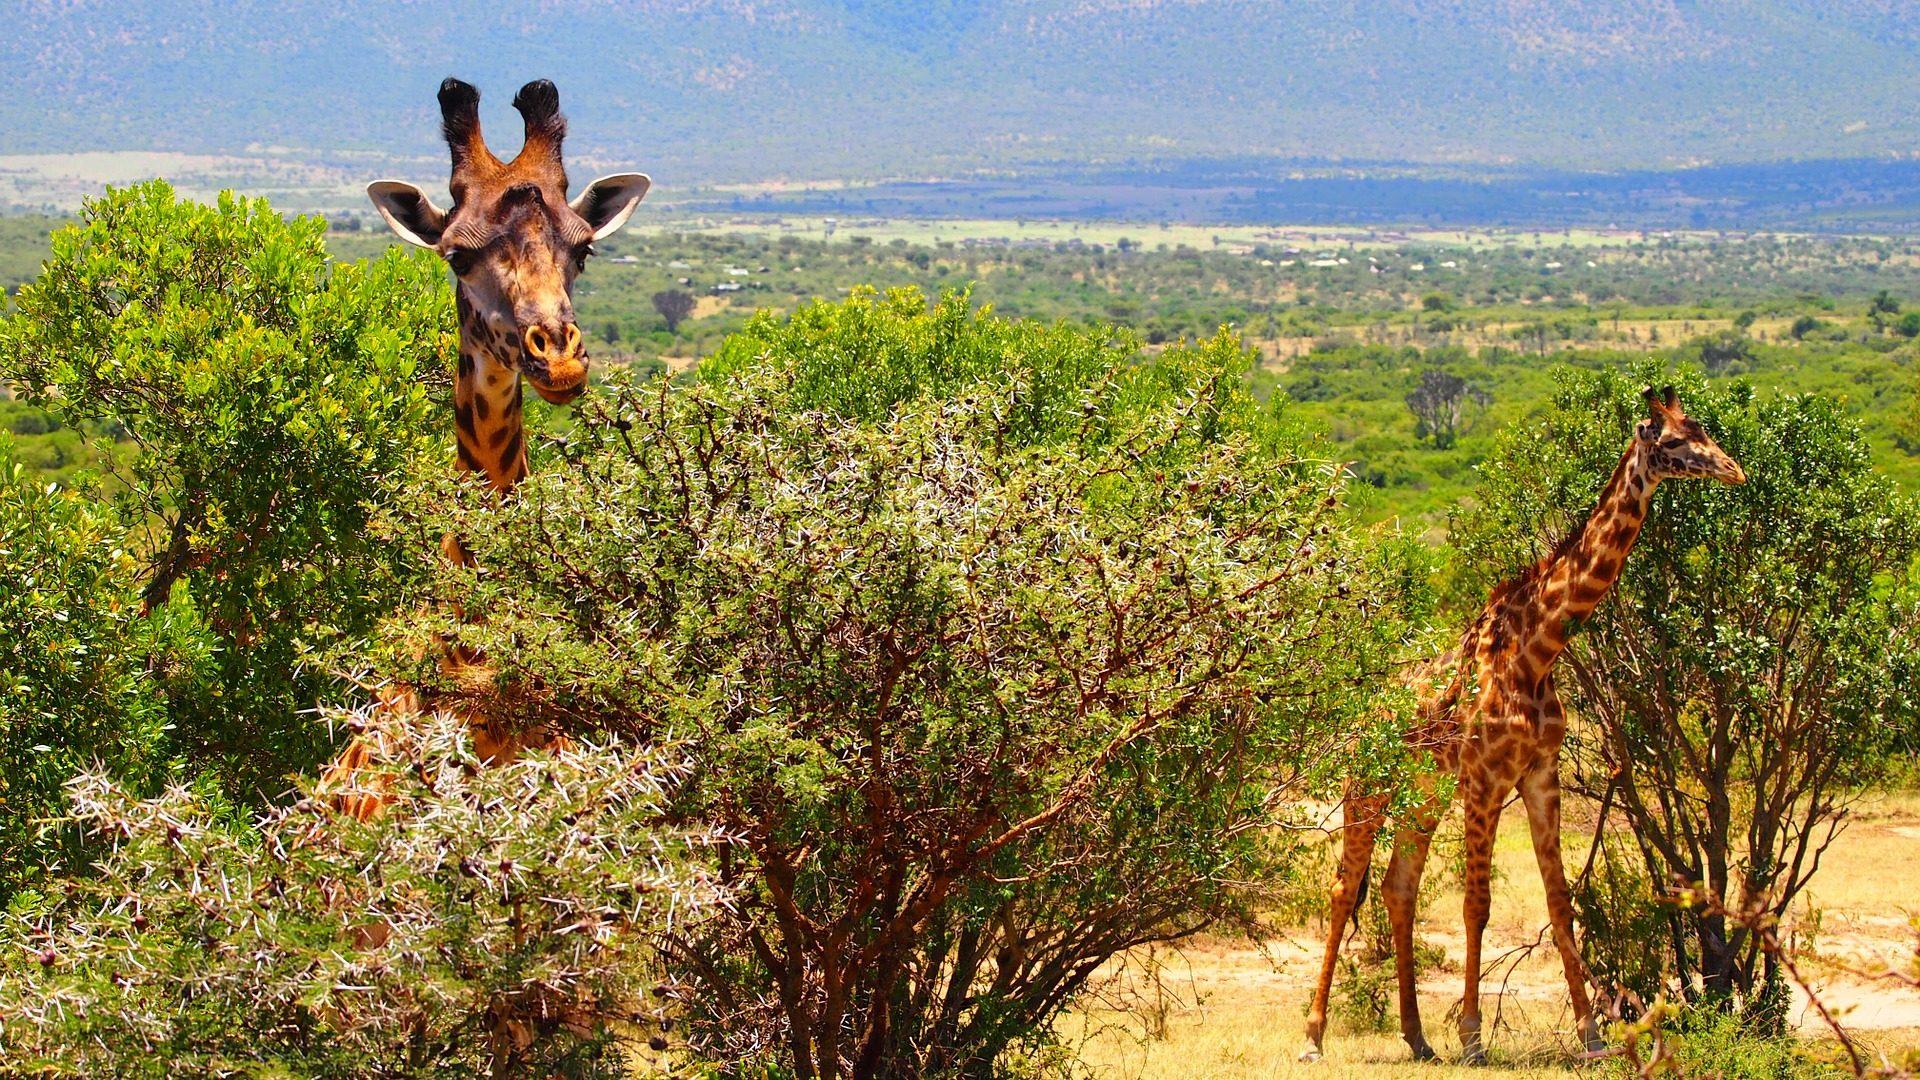 Cambio vita e vado a vivere in Kenya